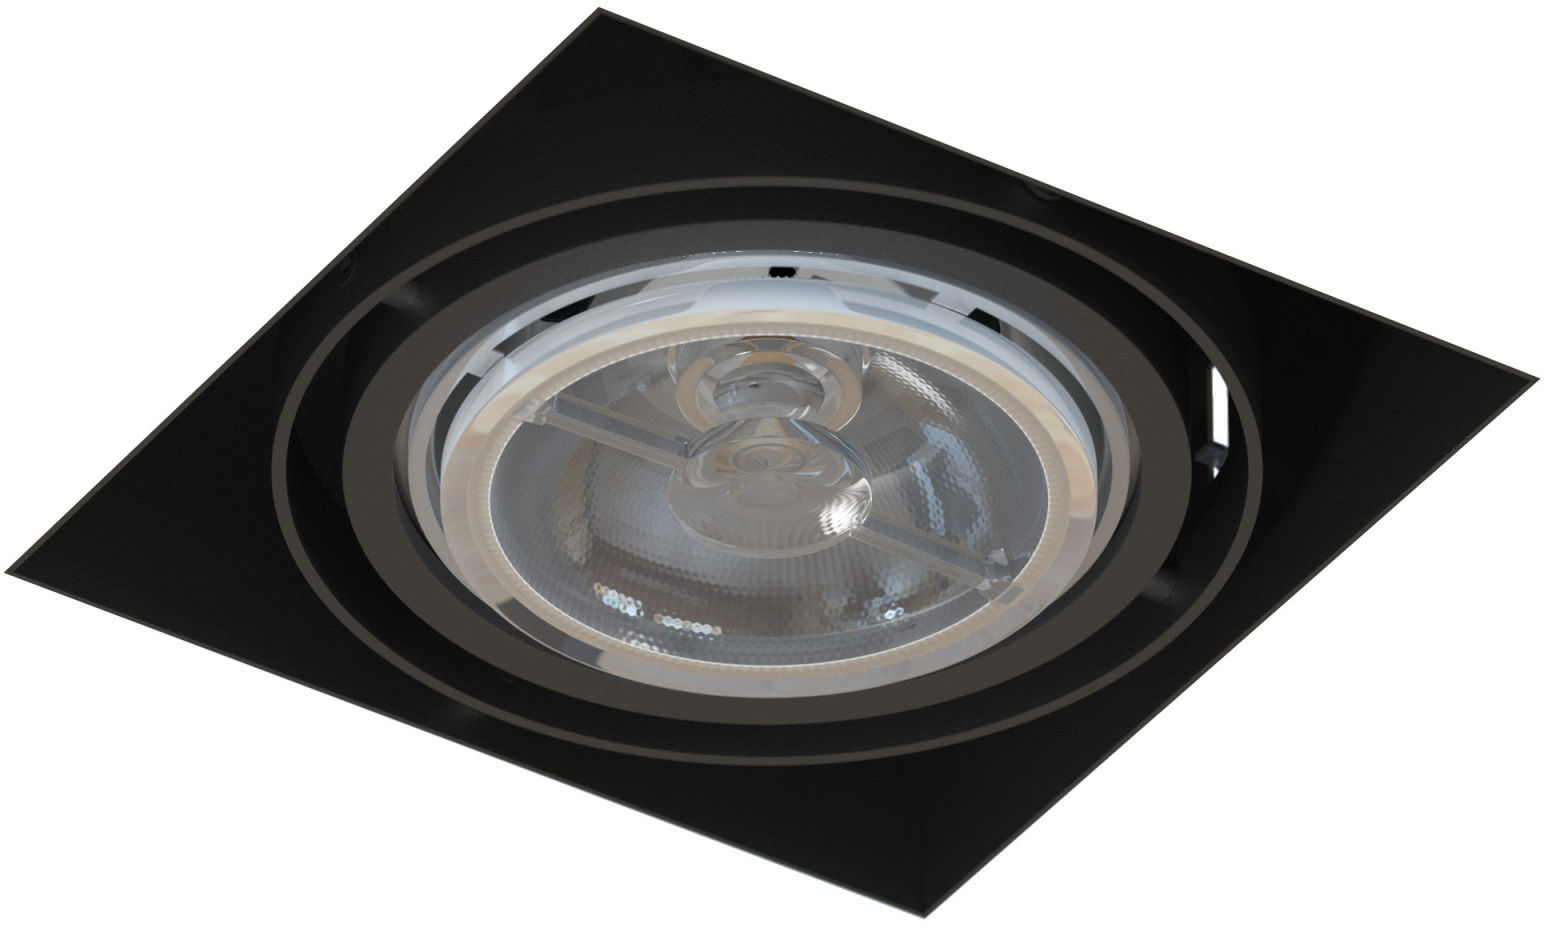 Oprawa wpuszczana bezramkowa Mara T018PB1Ah116 Cleoni nowoczesna lampa sufitowa